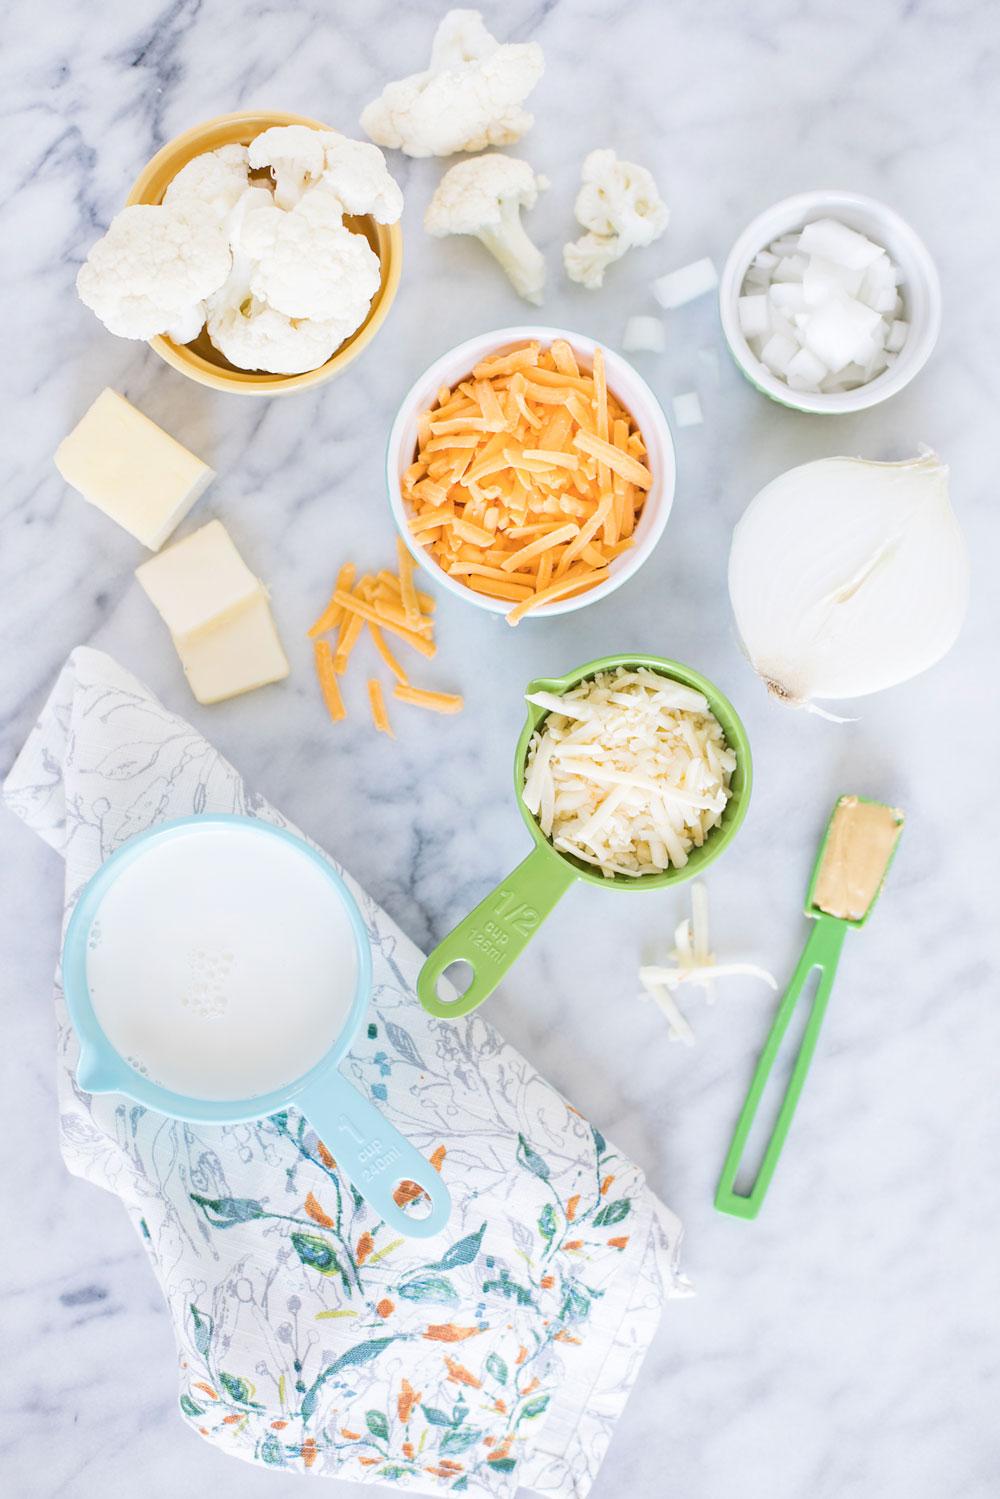 Creamy Cauliflower Cheese Soup Ingredients